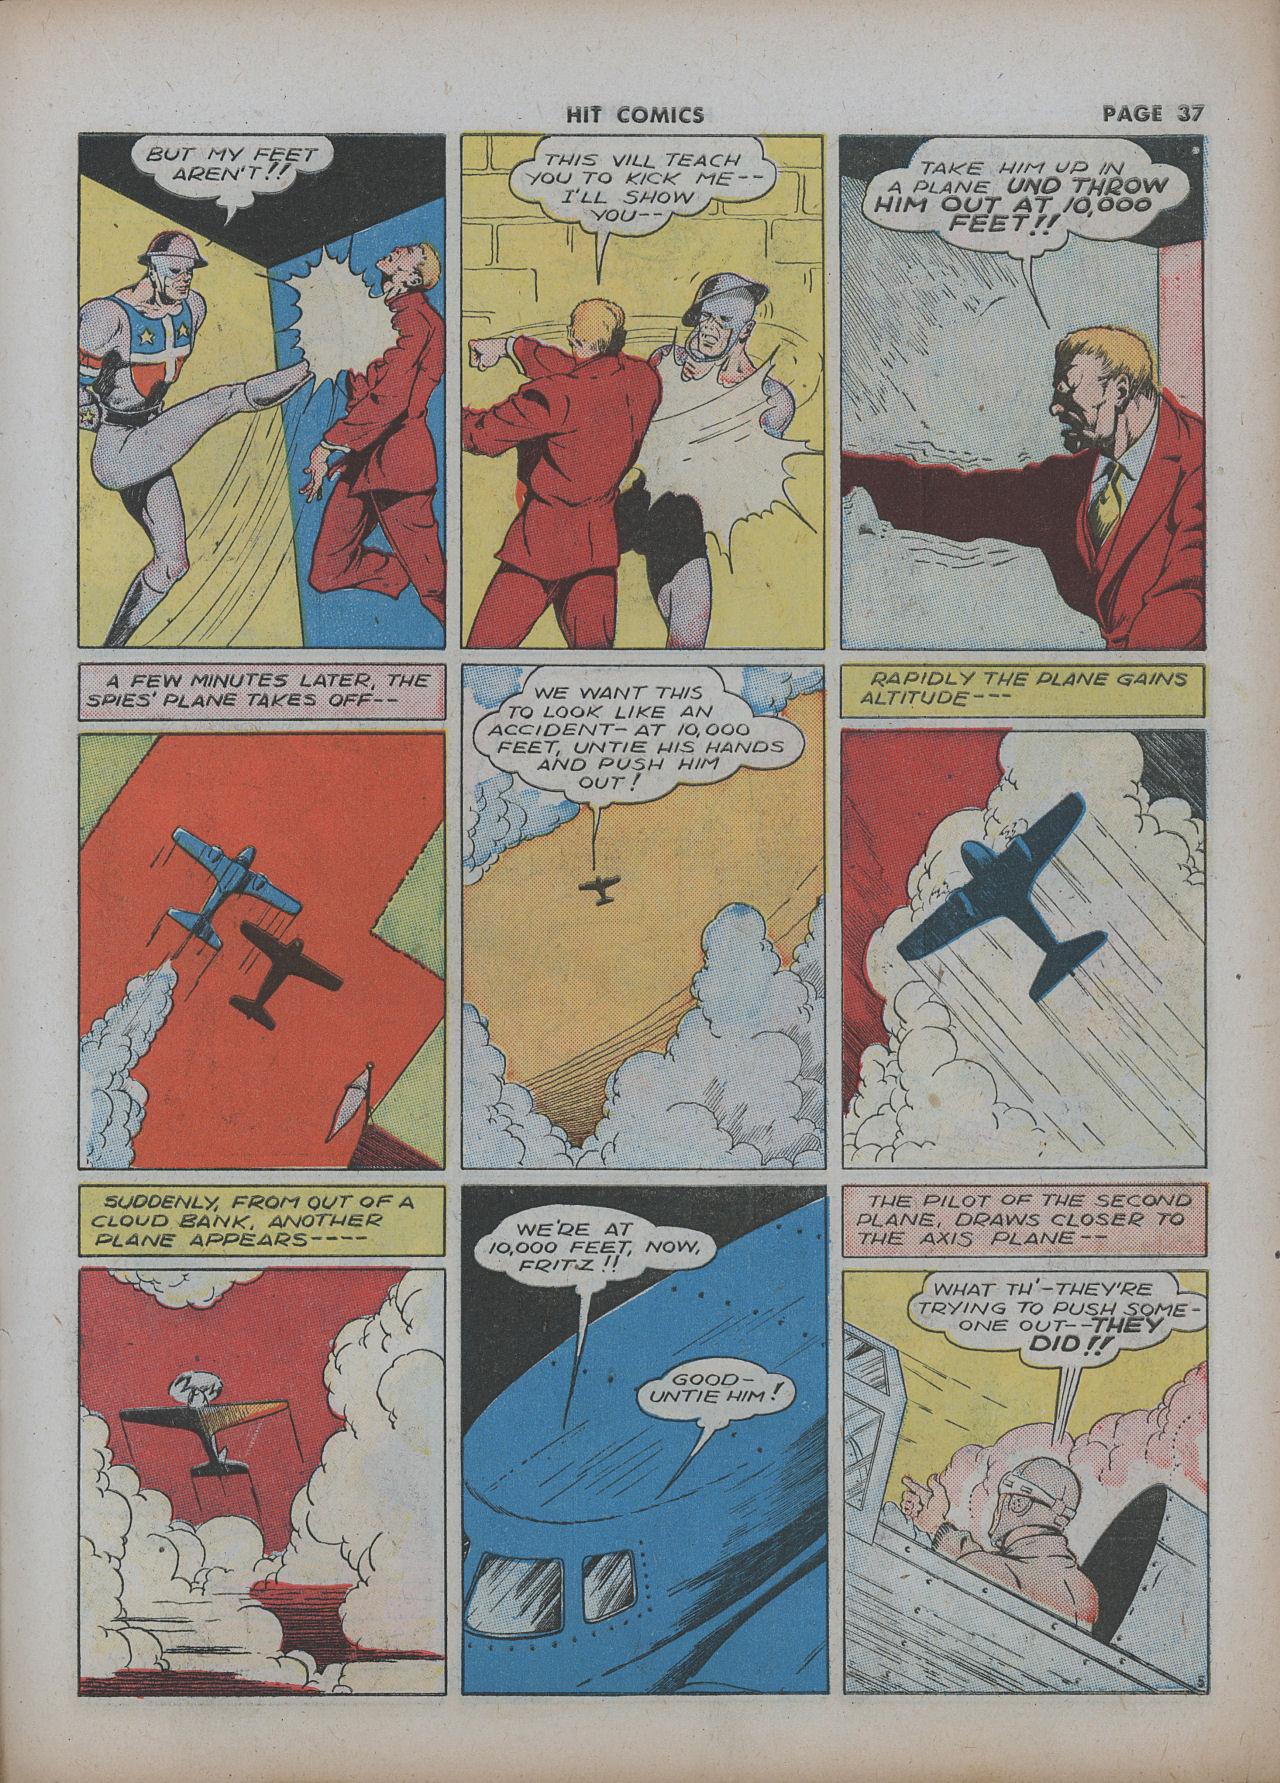 Read online Hit Comics comic -  Issue #22 - 39